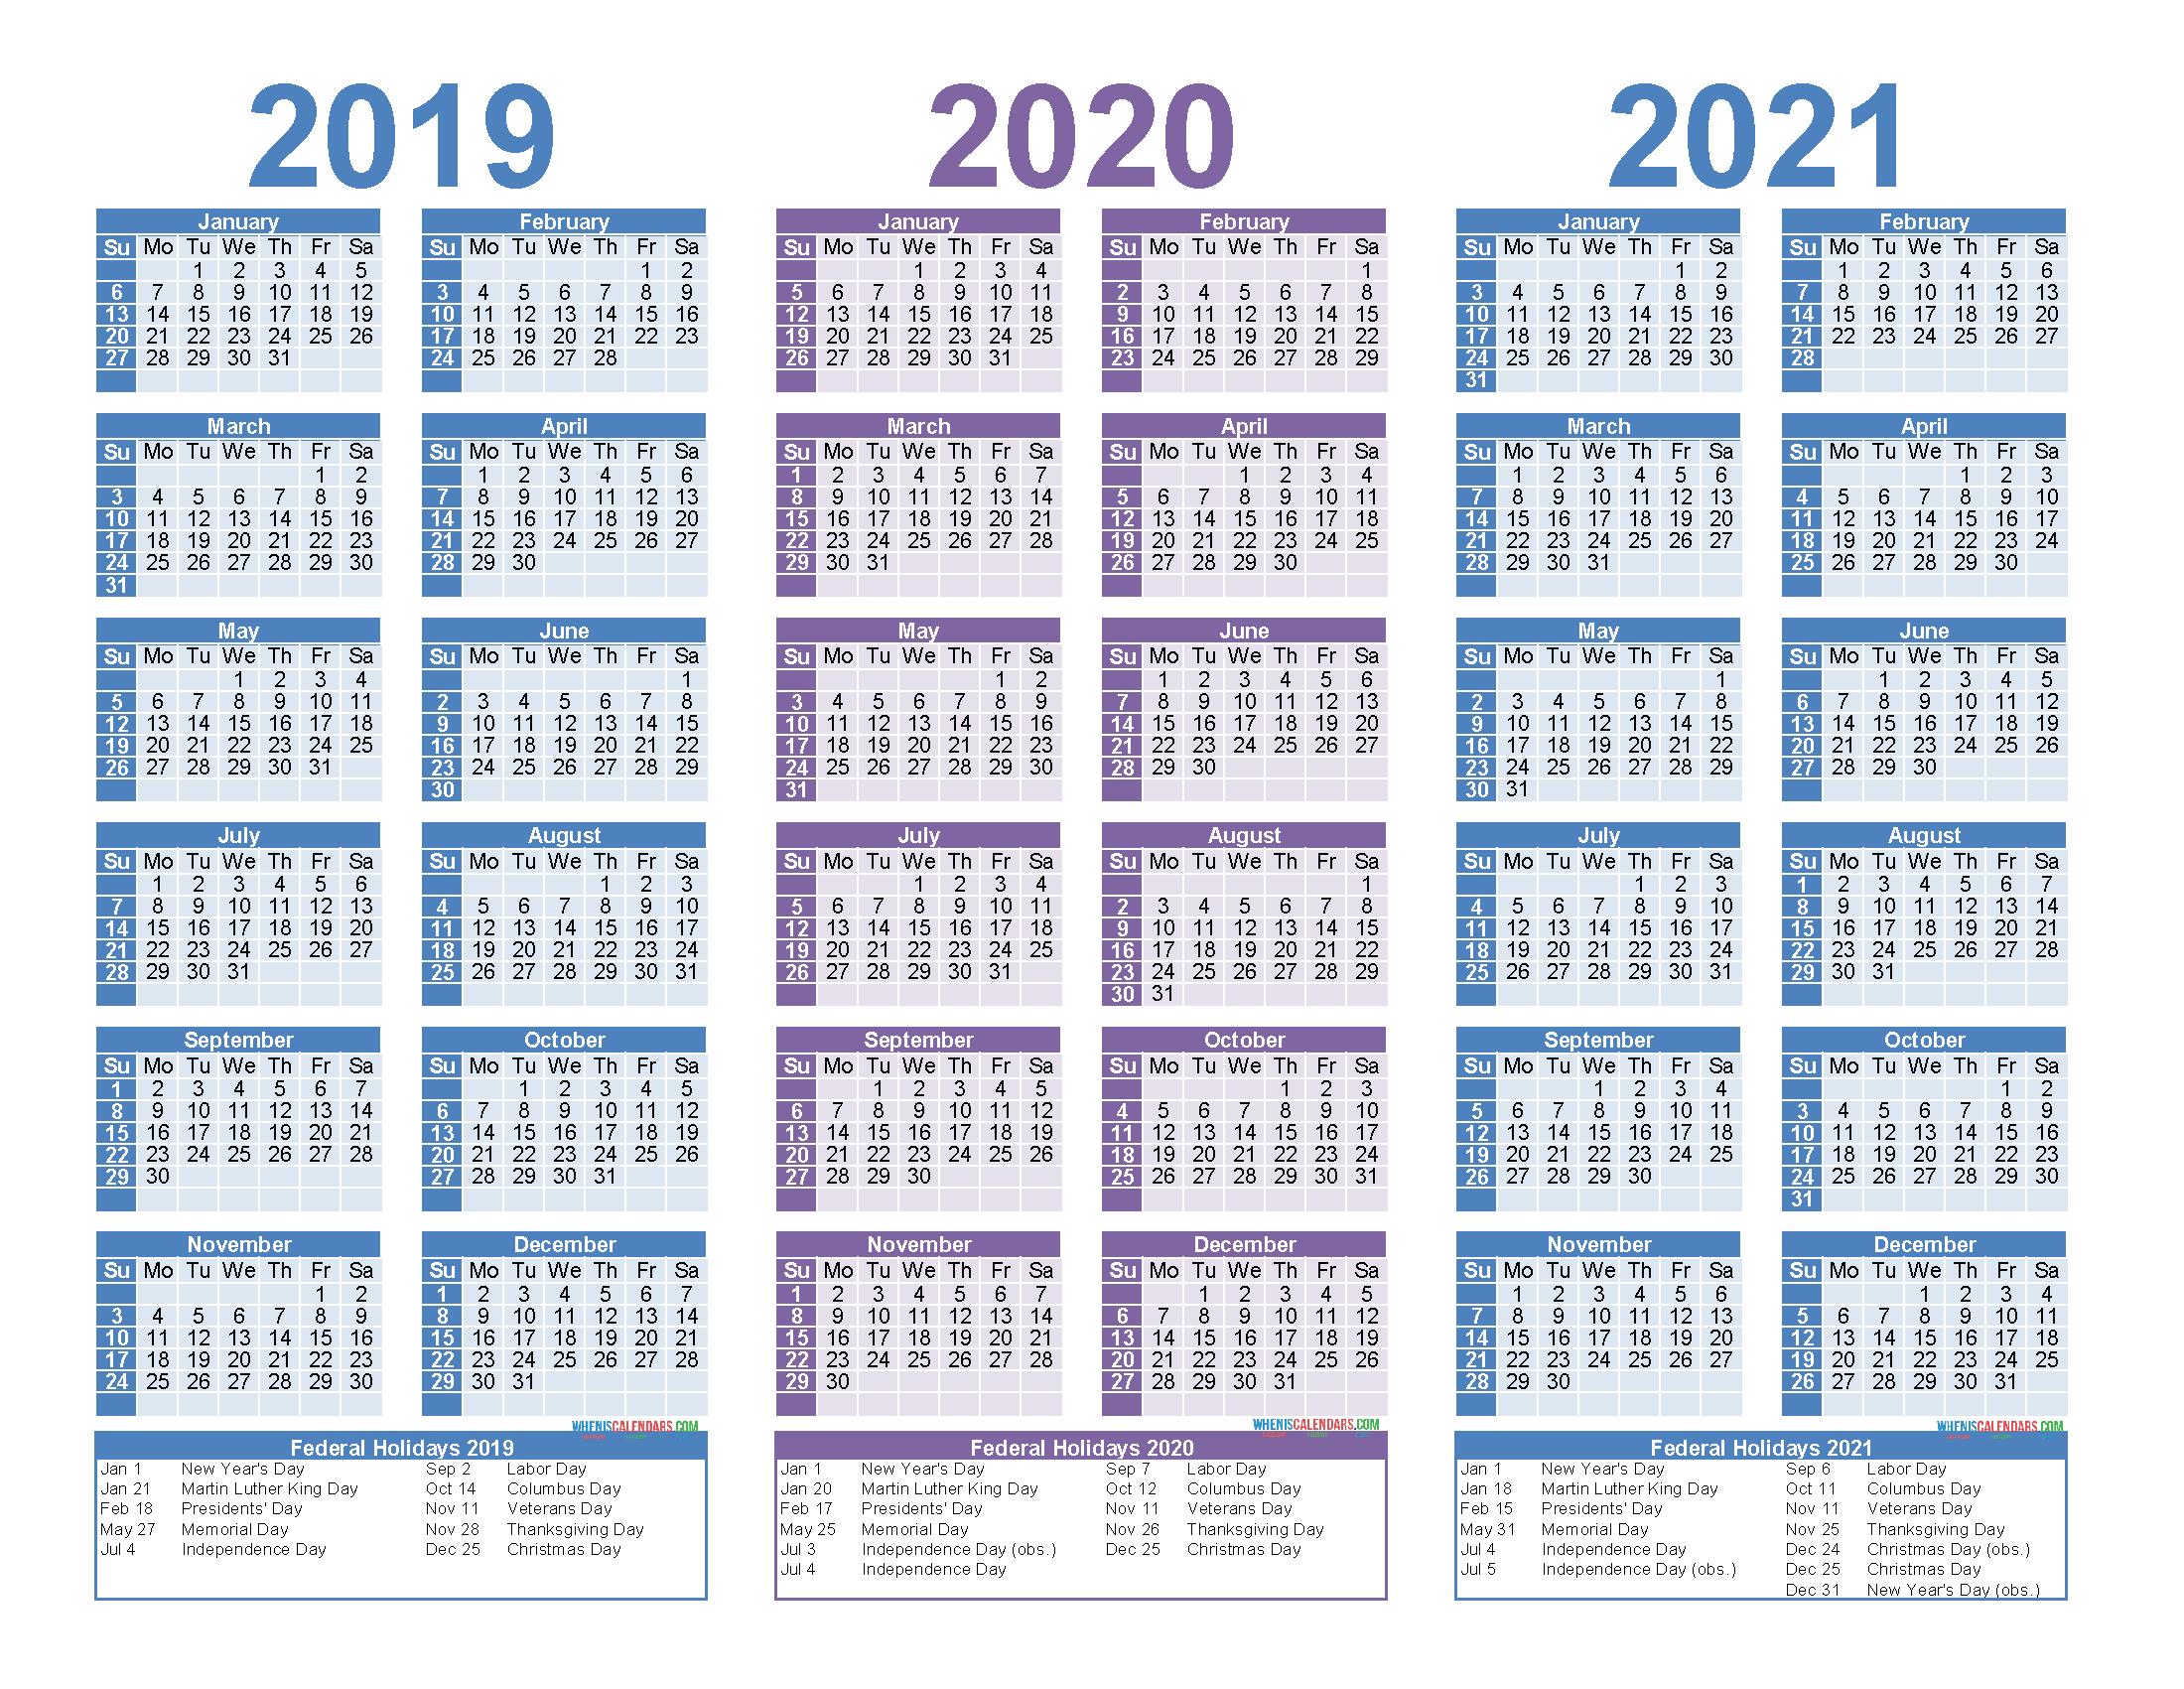 3 Year Calendar 2020 To 2021 Excel | Calendar For Planning for 3 Year Calendar 2020